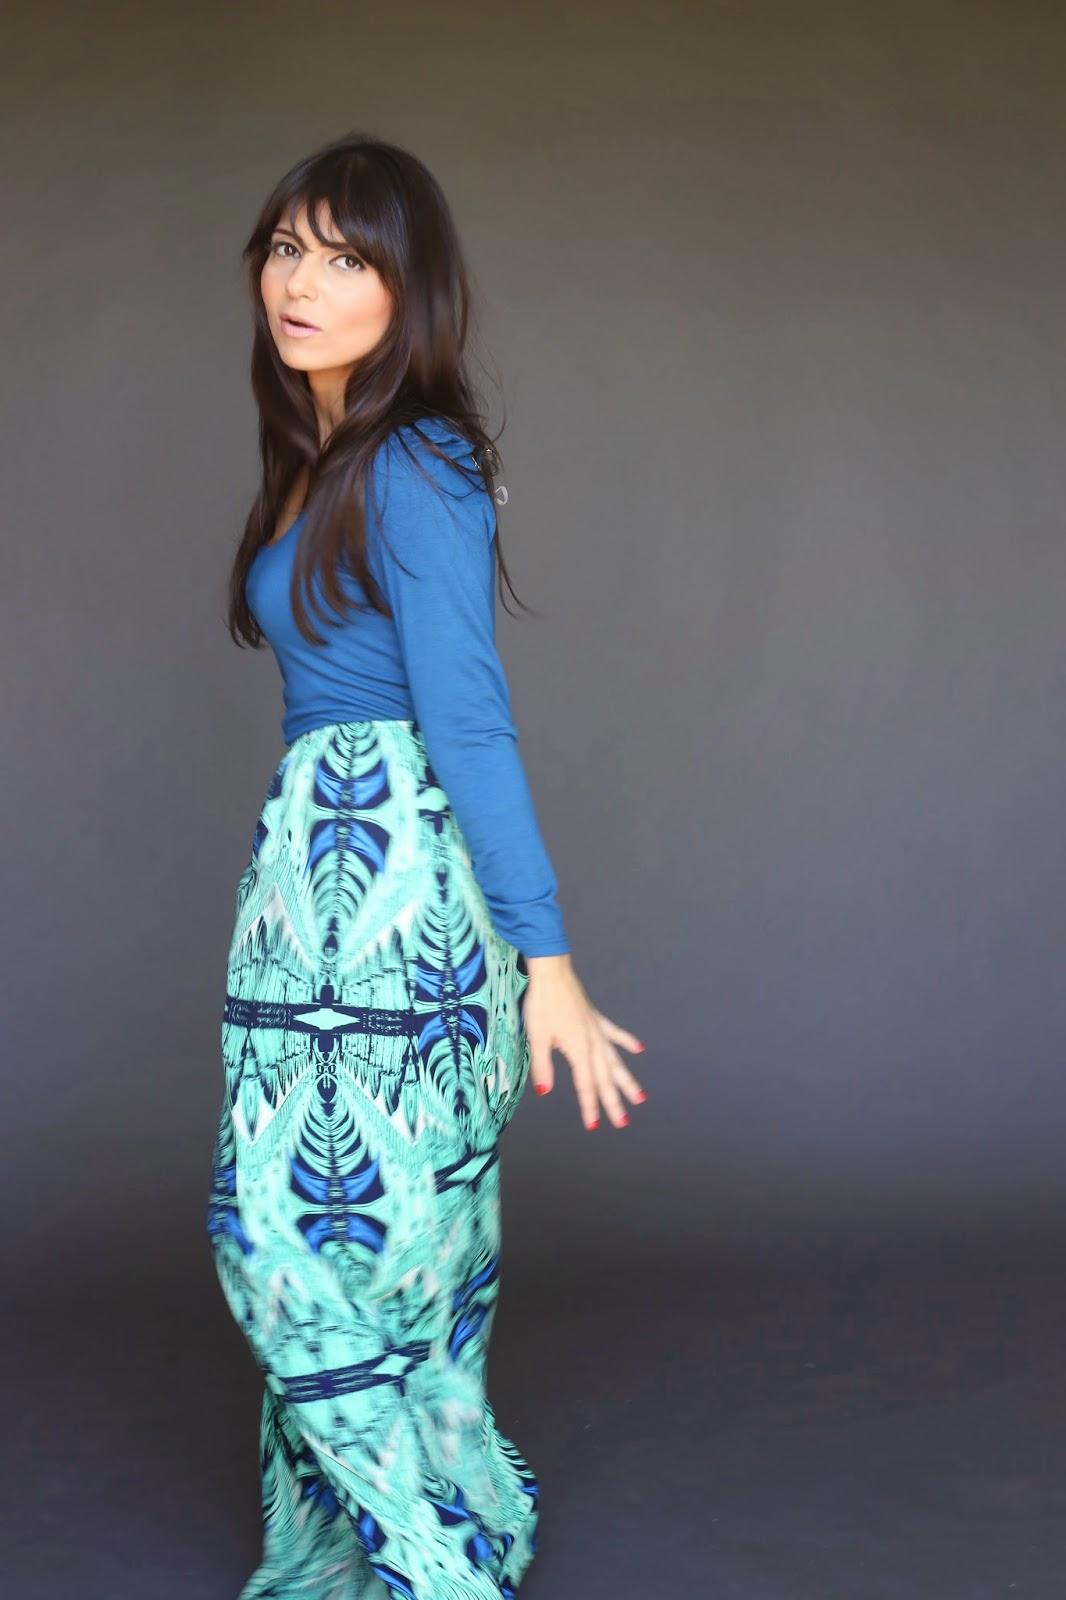 Long sleeve modest maxi dress with blue top and tribal print skirt Mode-sty hijab tznius fashion style islamic kosher